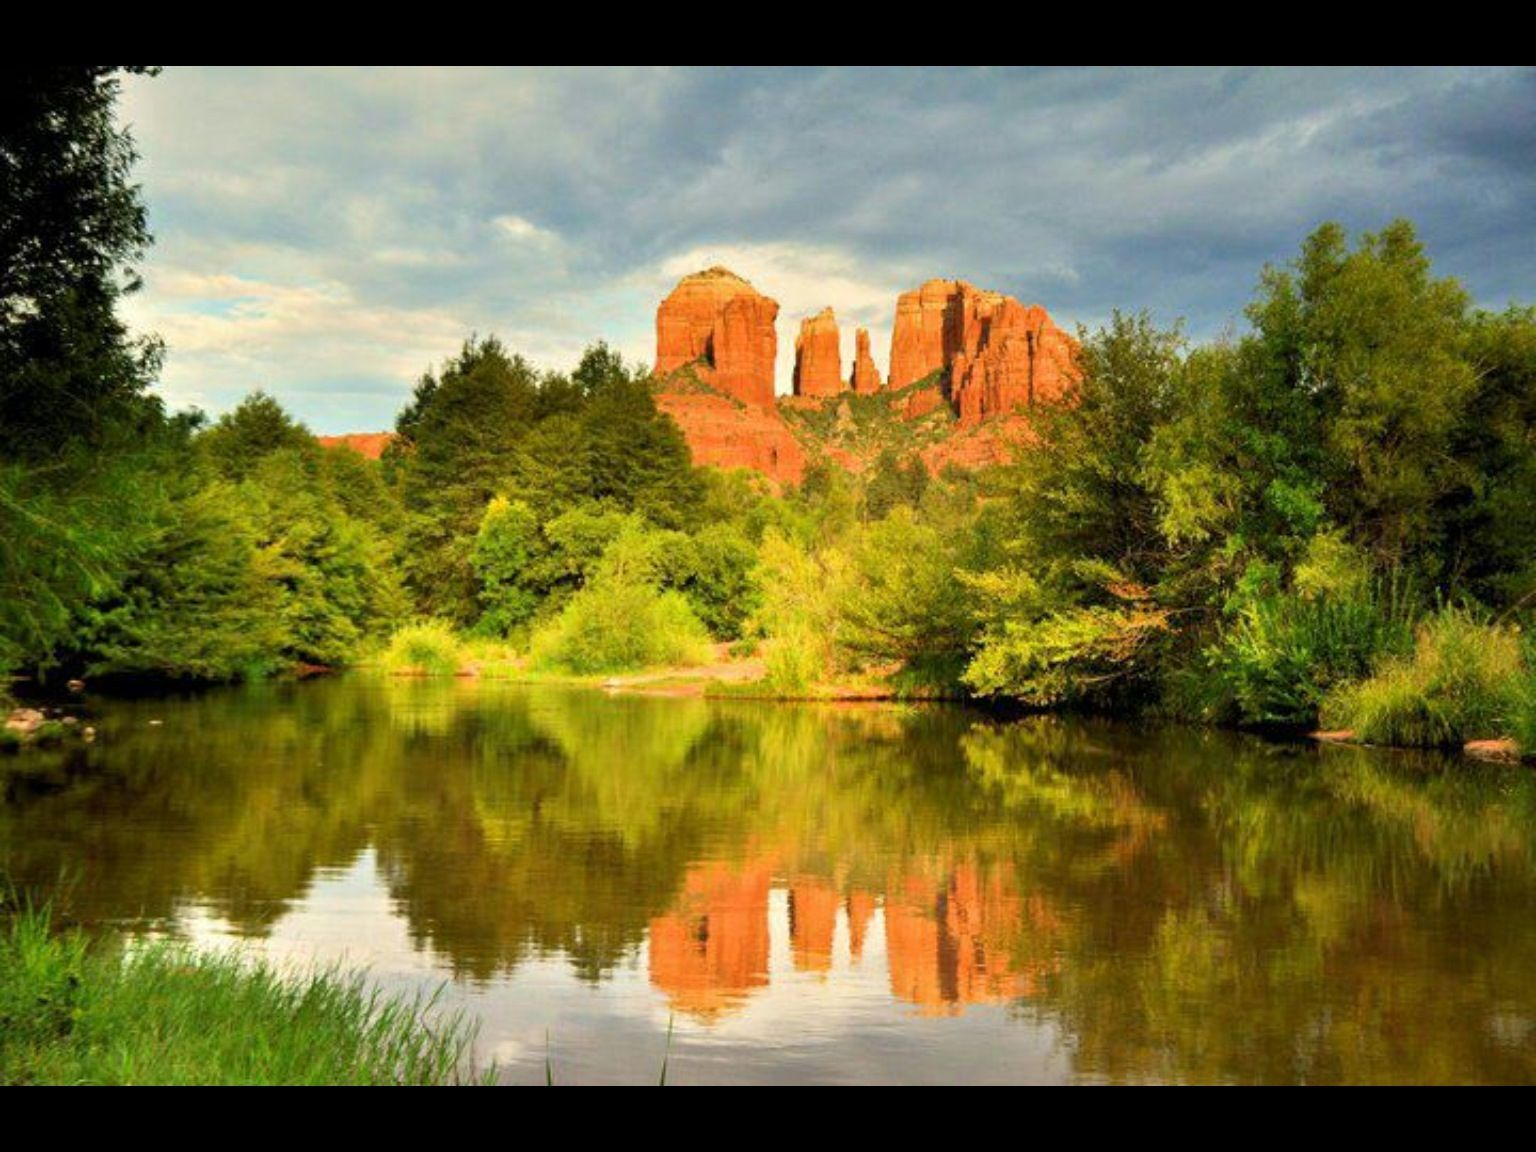 Our sedona nature adventure beautiful landscapes